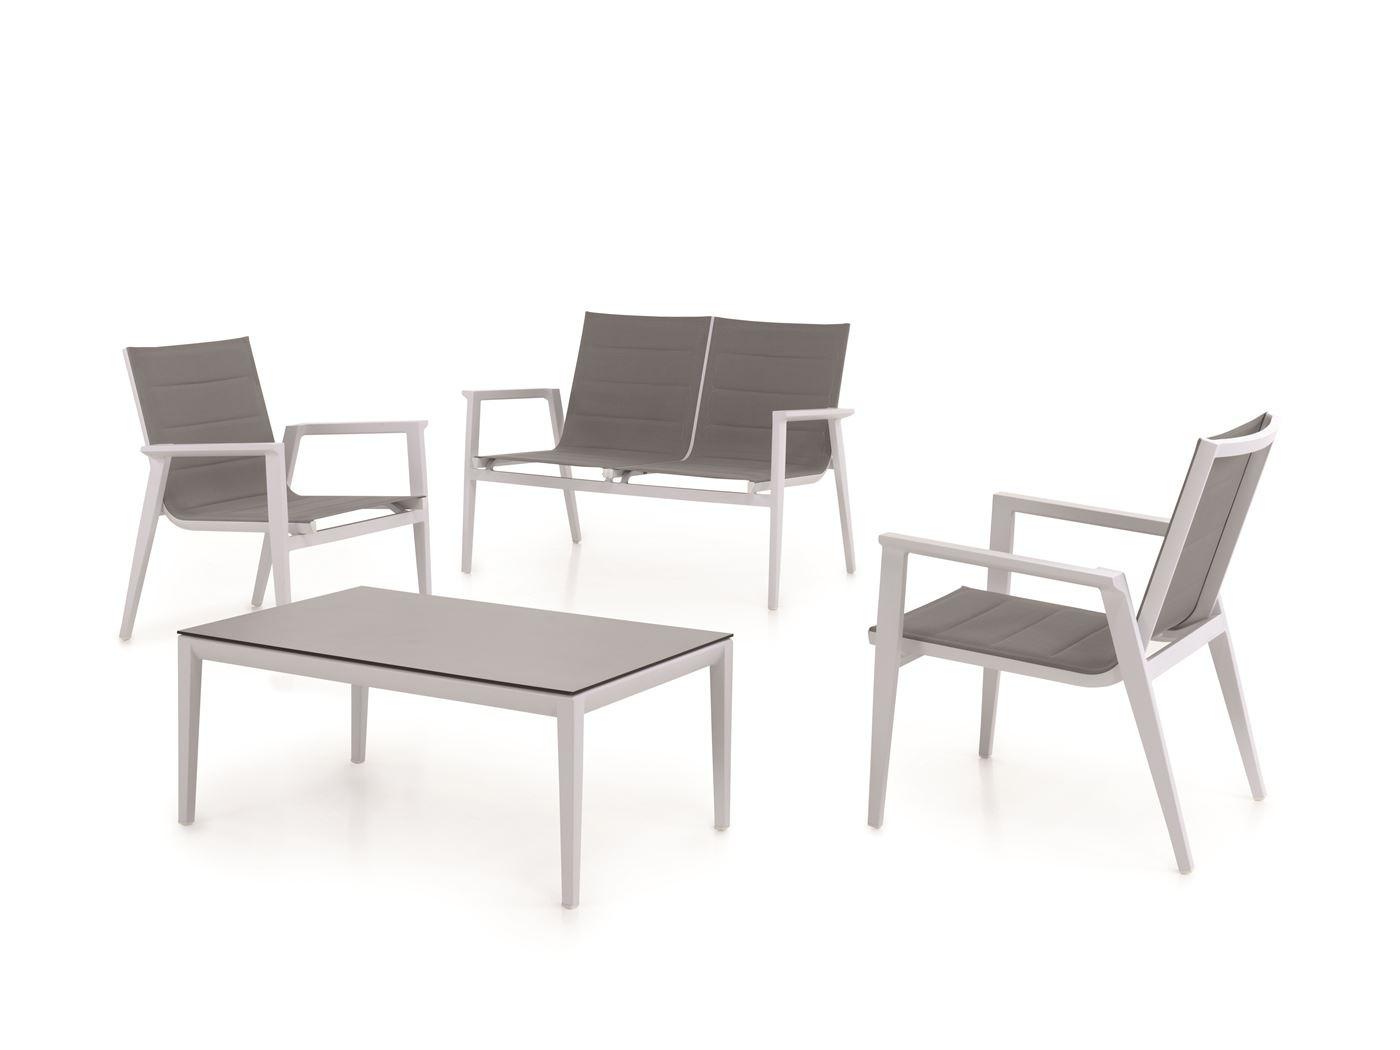 gescova aida lounge set alu white textylene grey light